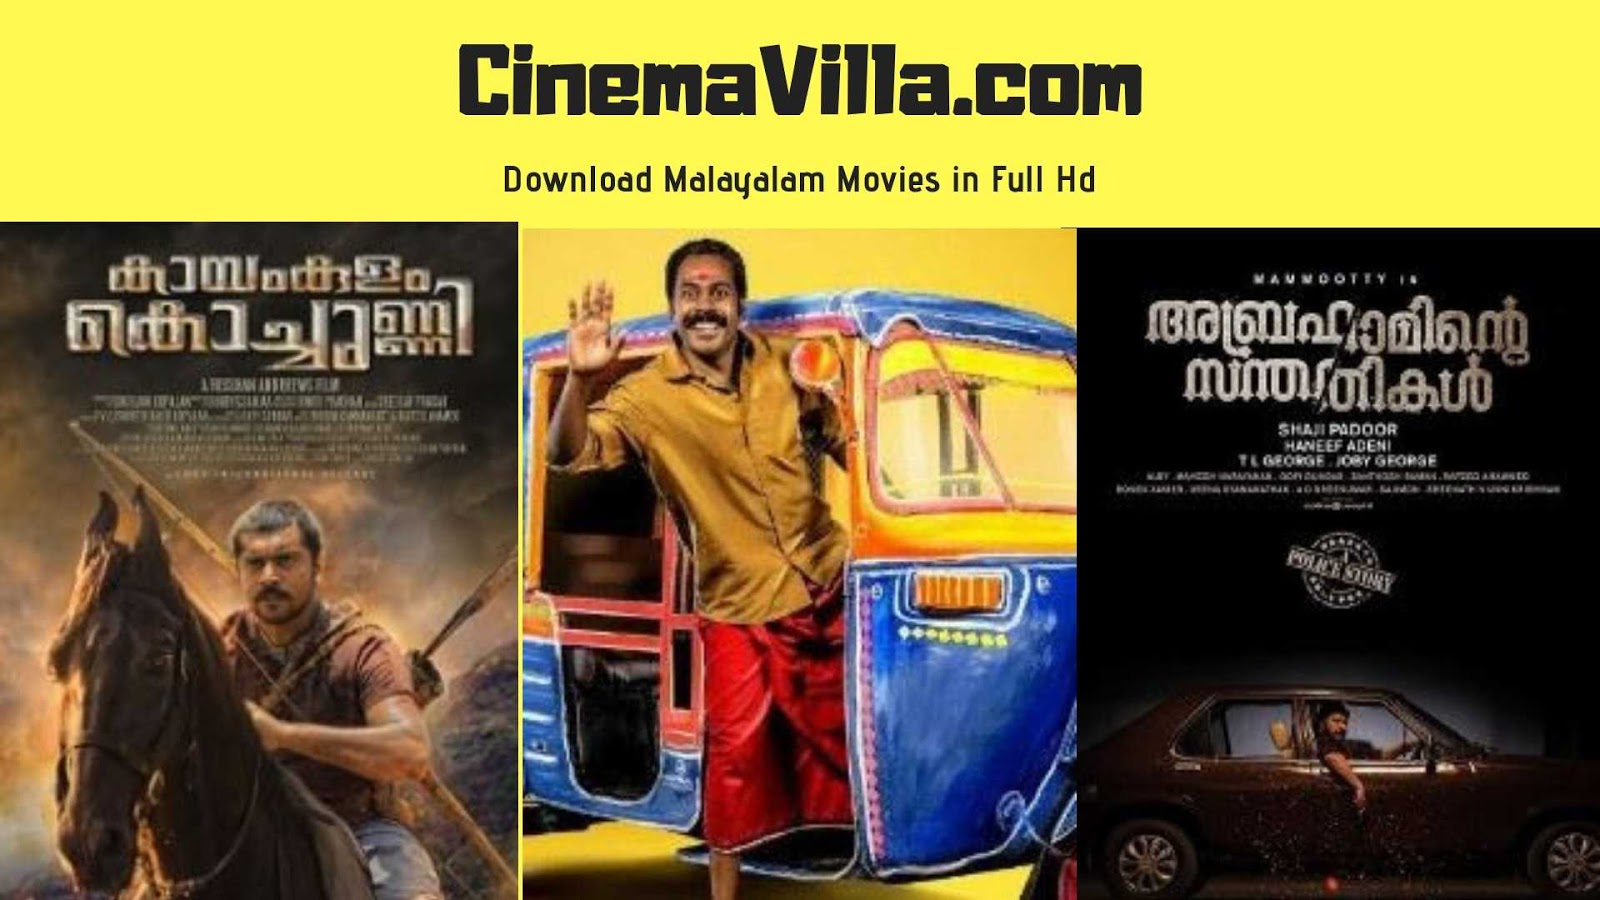 cinemavilla 2019 malayalam movie